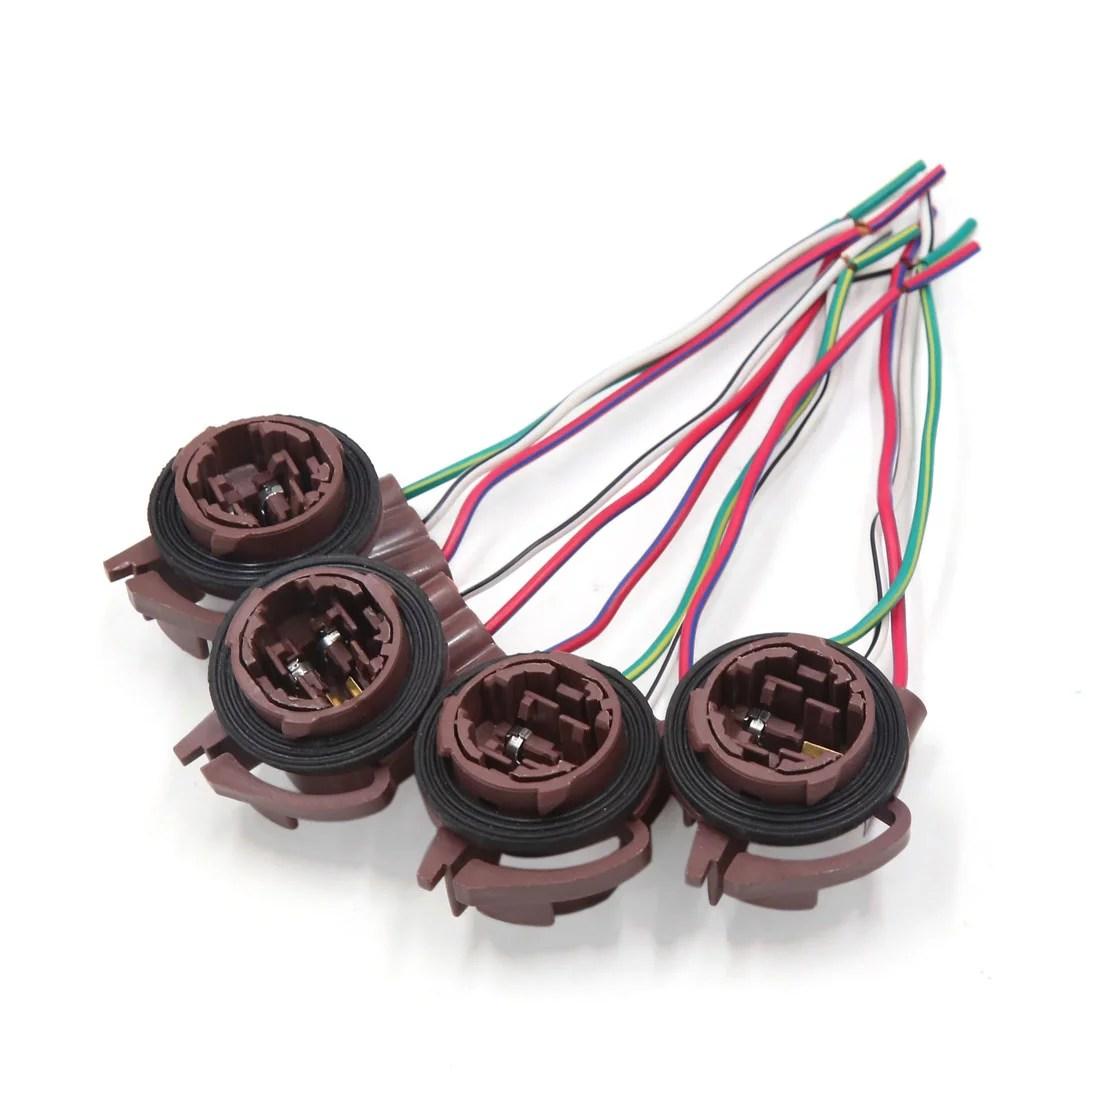 hight resolution of 4pcs 3157 4157 brake light lamp bulb wiring harness socket connector for car walmart canada